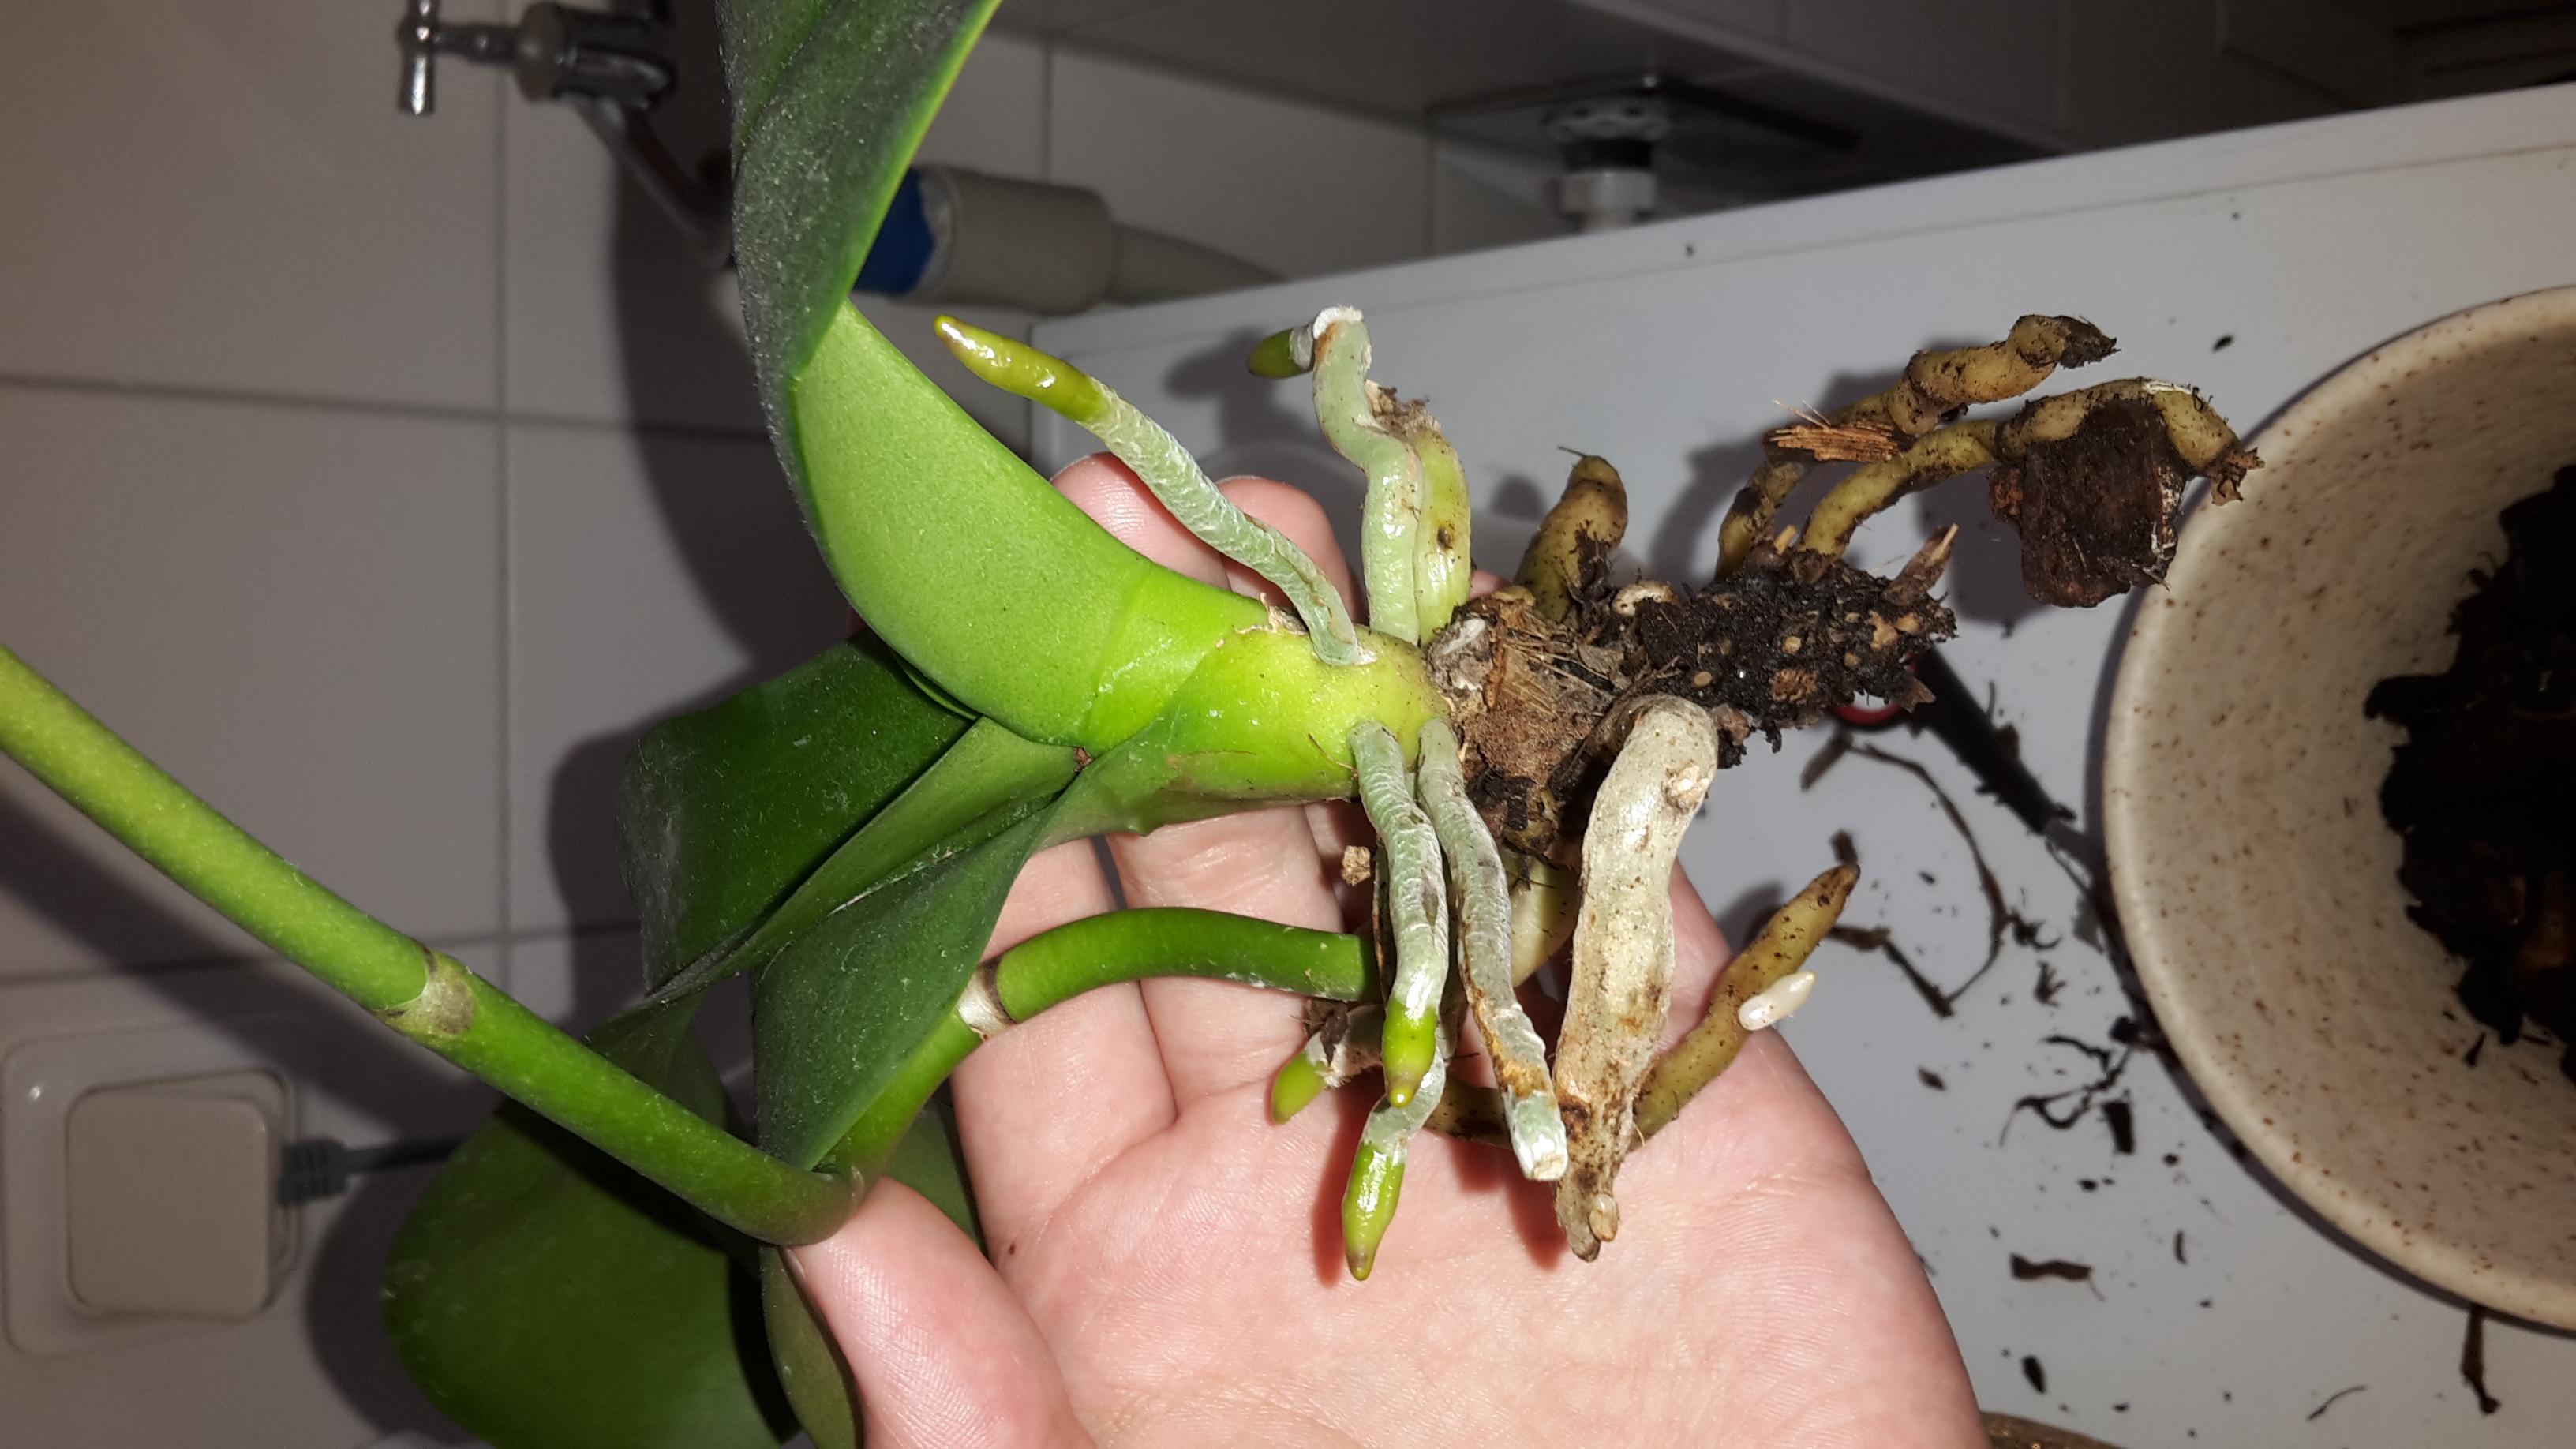 orchidee stengel oder wurzel pflanzen pflanzenpflege. Black Bedroom Furniture Sets. Home Design Ideas